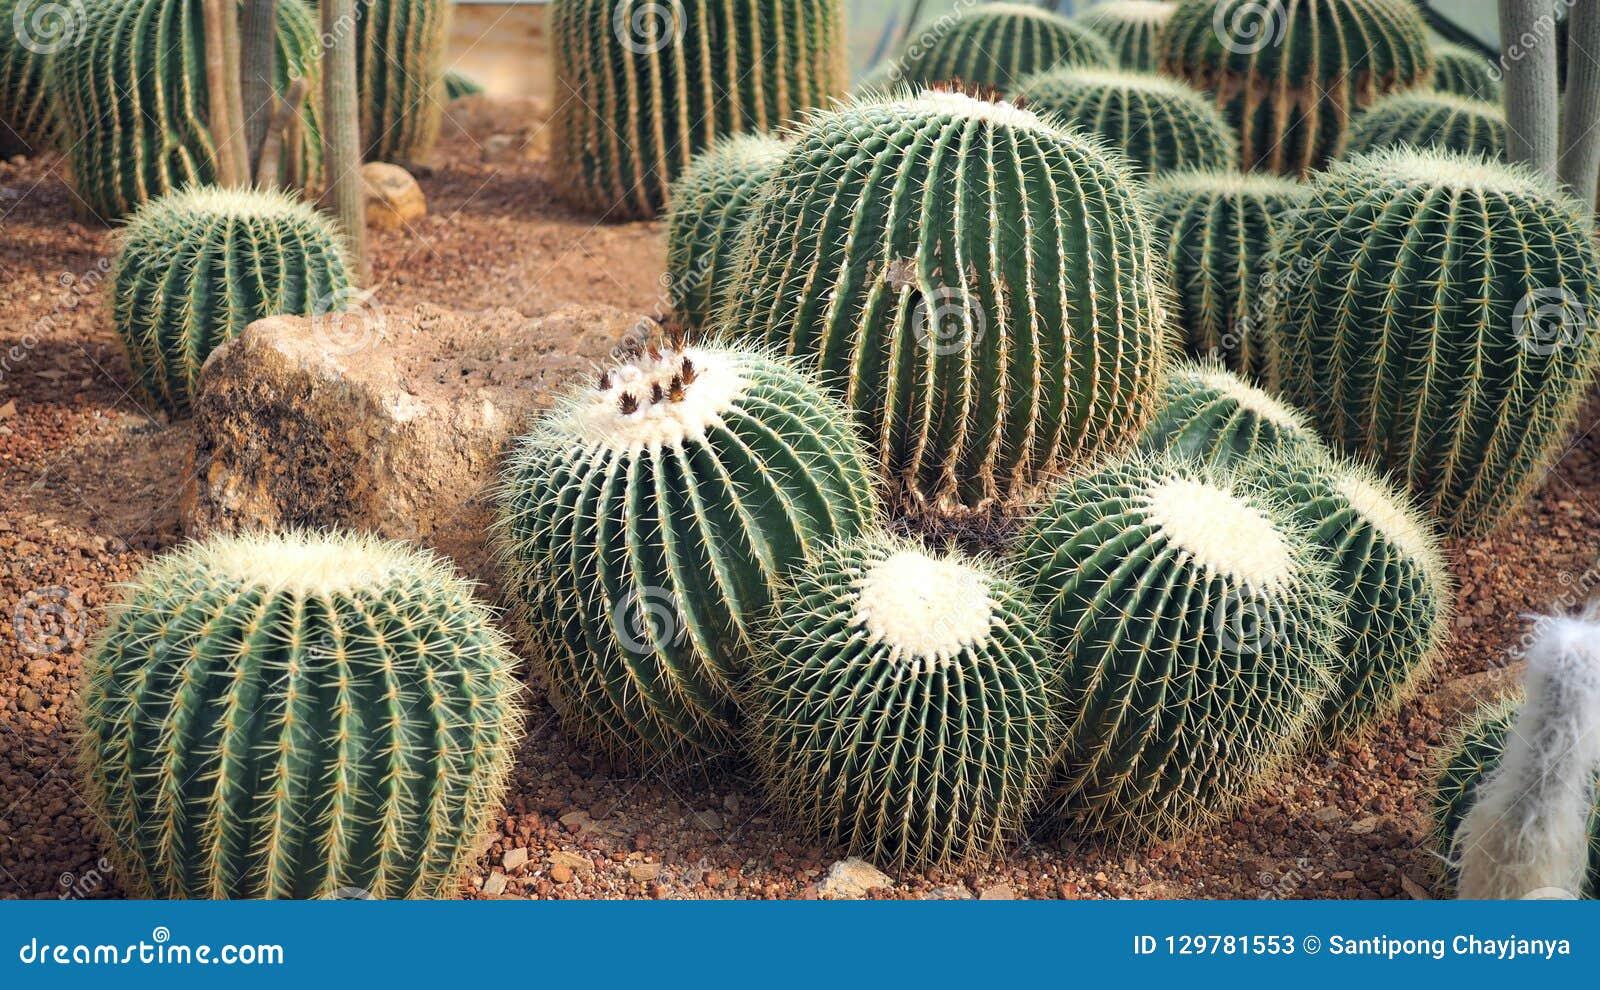 Golden barrel cactus or Echinocactus grusonii in the botanic garden. Close up of a round green cactaceae with spikes. Echinocactu